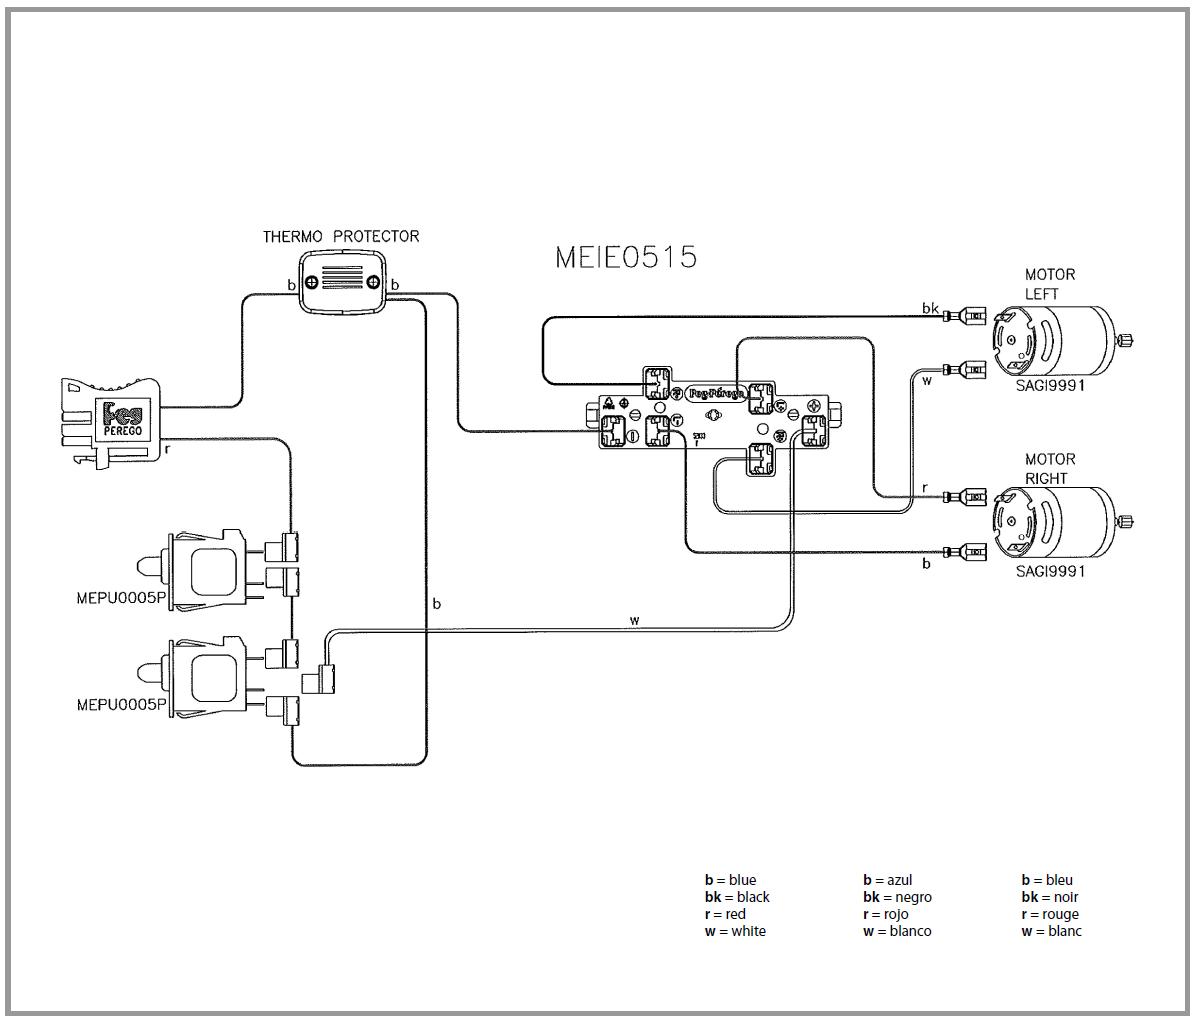 Polaris Atv Wiring Diagram On 92 Snowmobile in addition 2013 Polaris Ranger Crew 800 Owners Manual additionally Wiring Diagram For Polaris Ranger 2000 also RepairGuideContent in addition 2006 Polaris Ranger Wiring Diagram Ecm. on wiring diagram for a 2011 polaris ranger crew